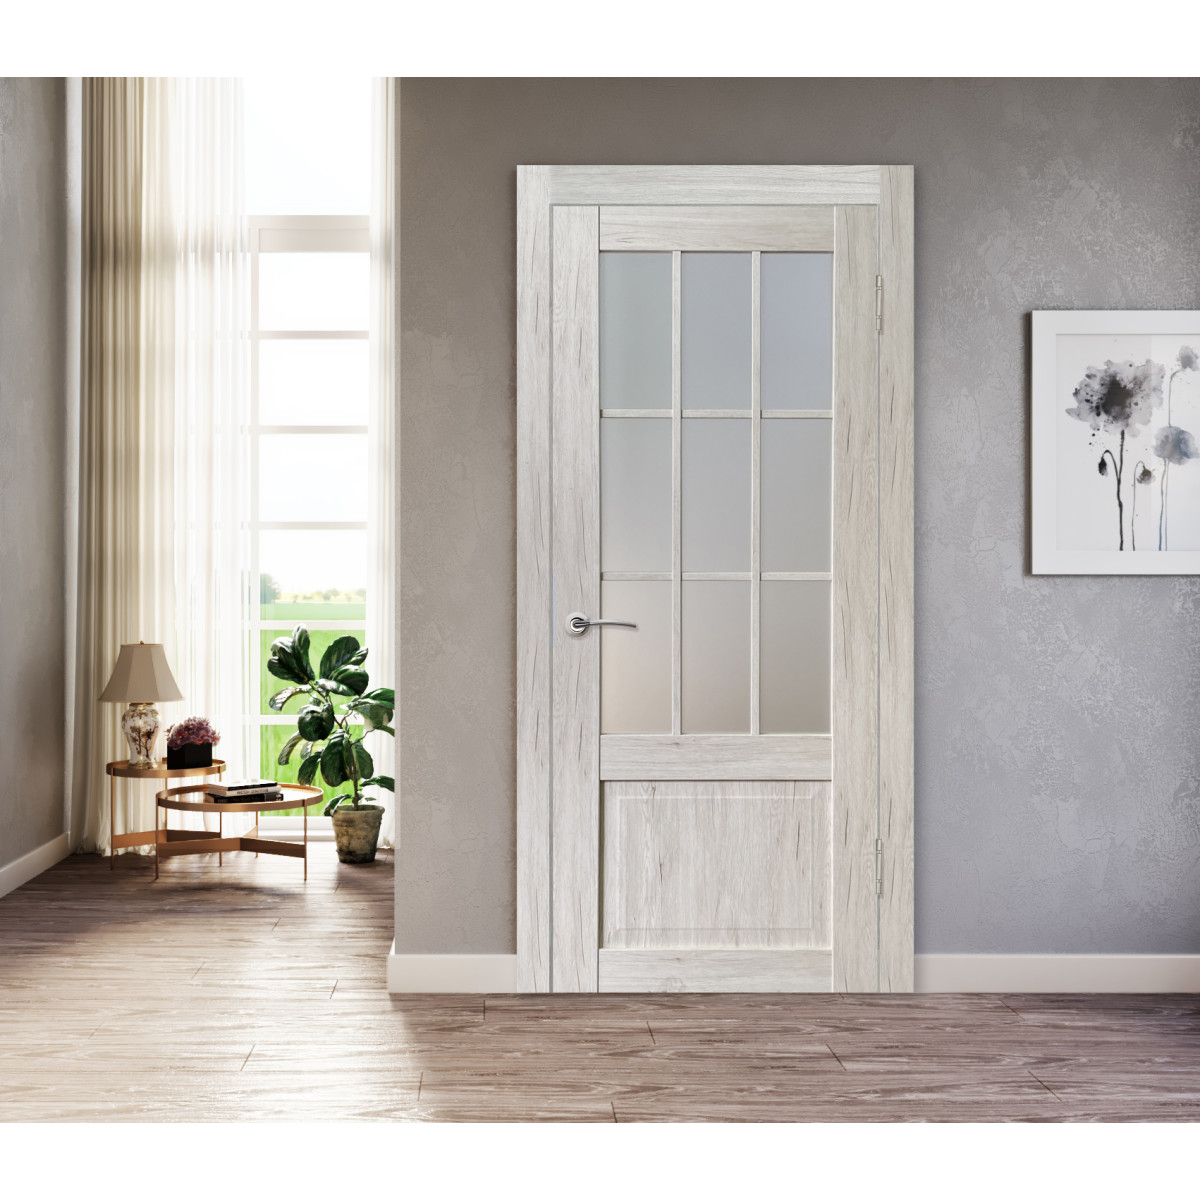 Дверь Межкомнатная Остеклённая Амелия 90Х200 С Фурнитурой Пвх Цвет Рустик Серый